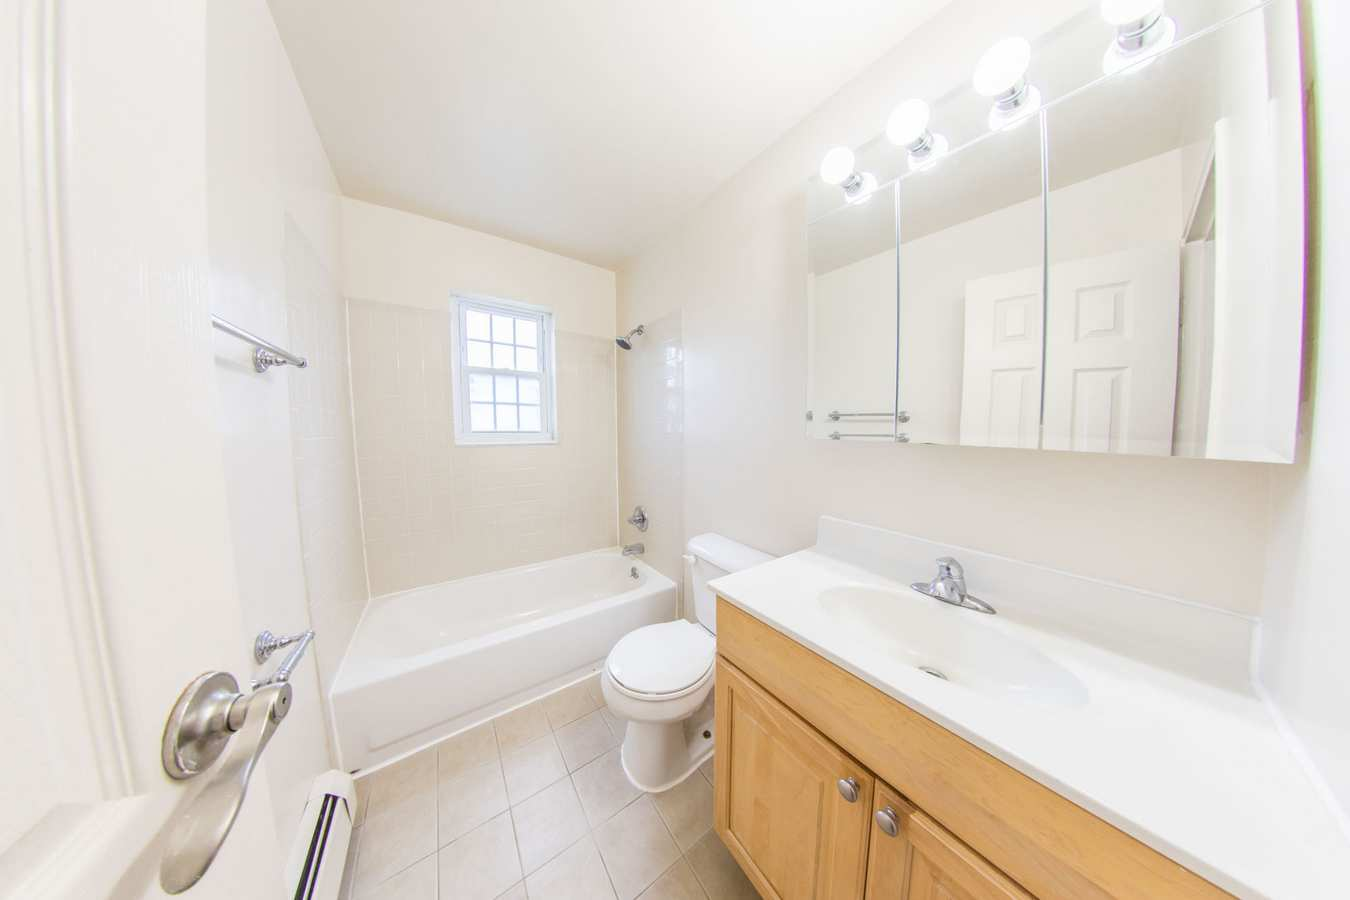 Model bathroom at The Manors in Pomona, New York